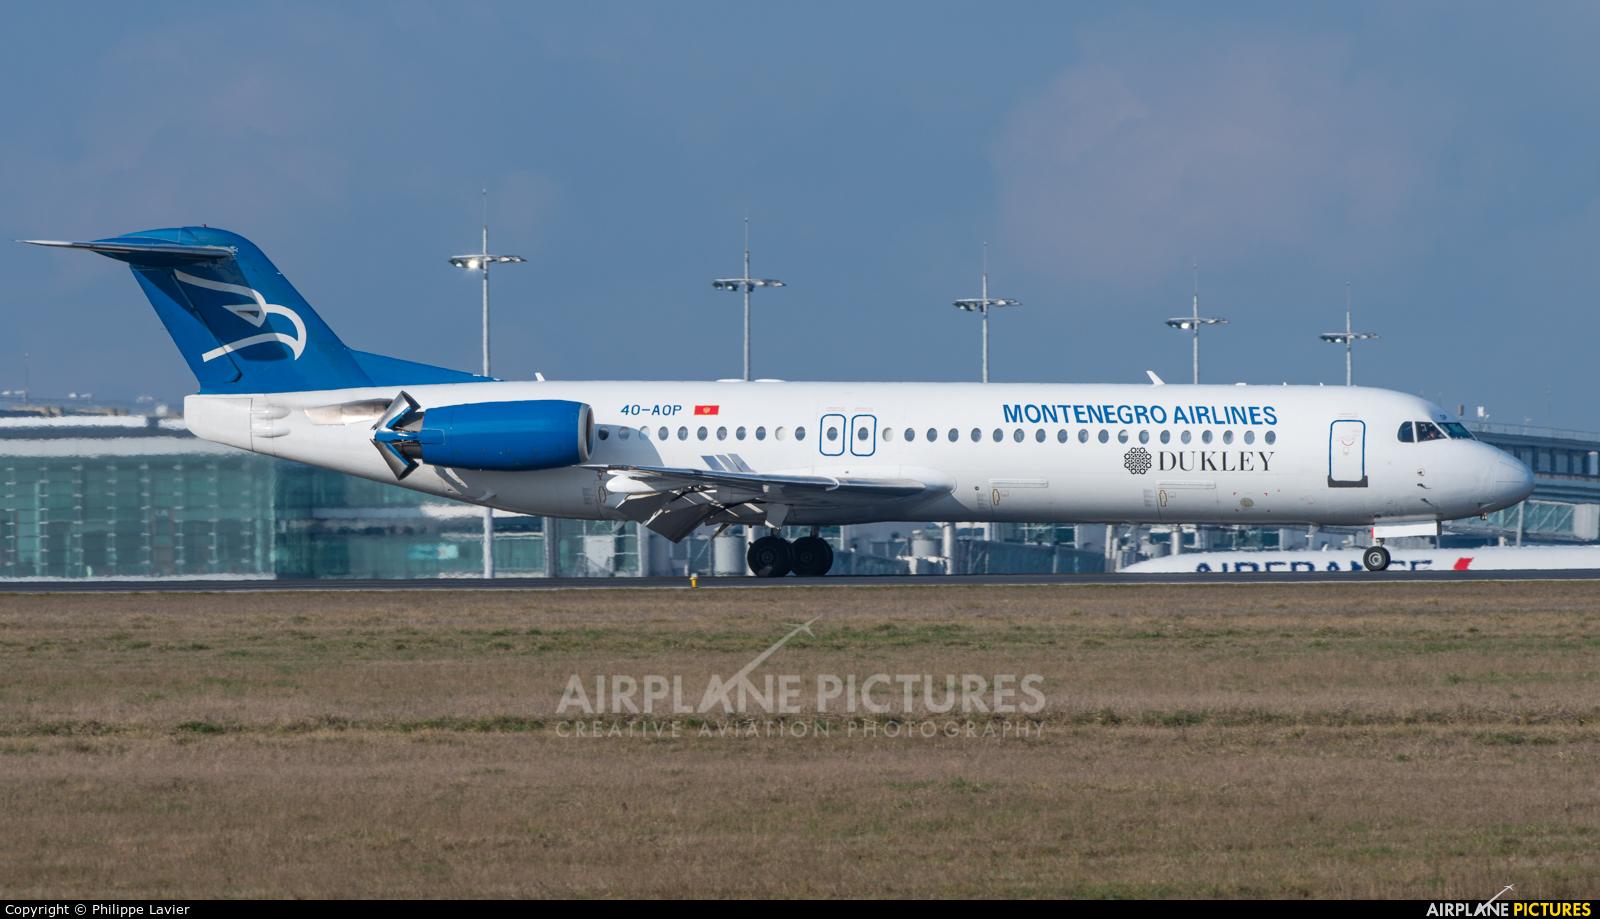 Montenegro Airlines 4O-AOP aircraft at Paris - Charles de Gaulle